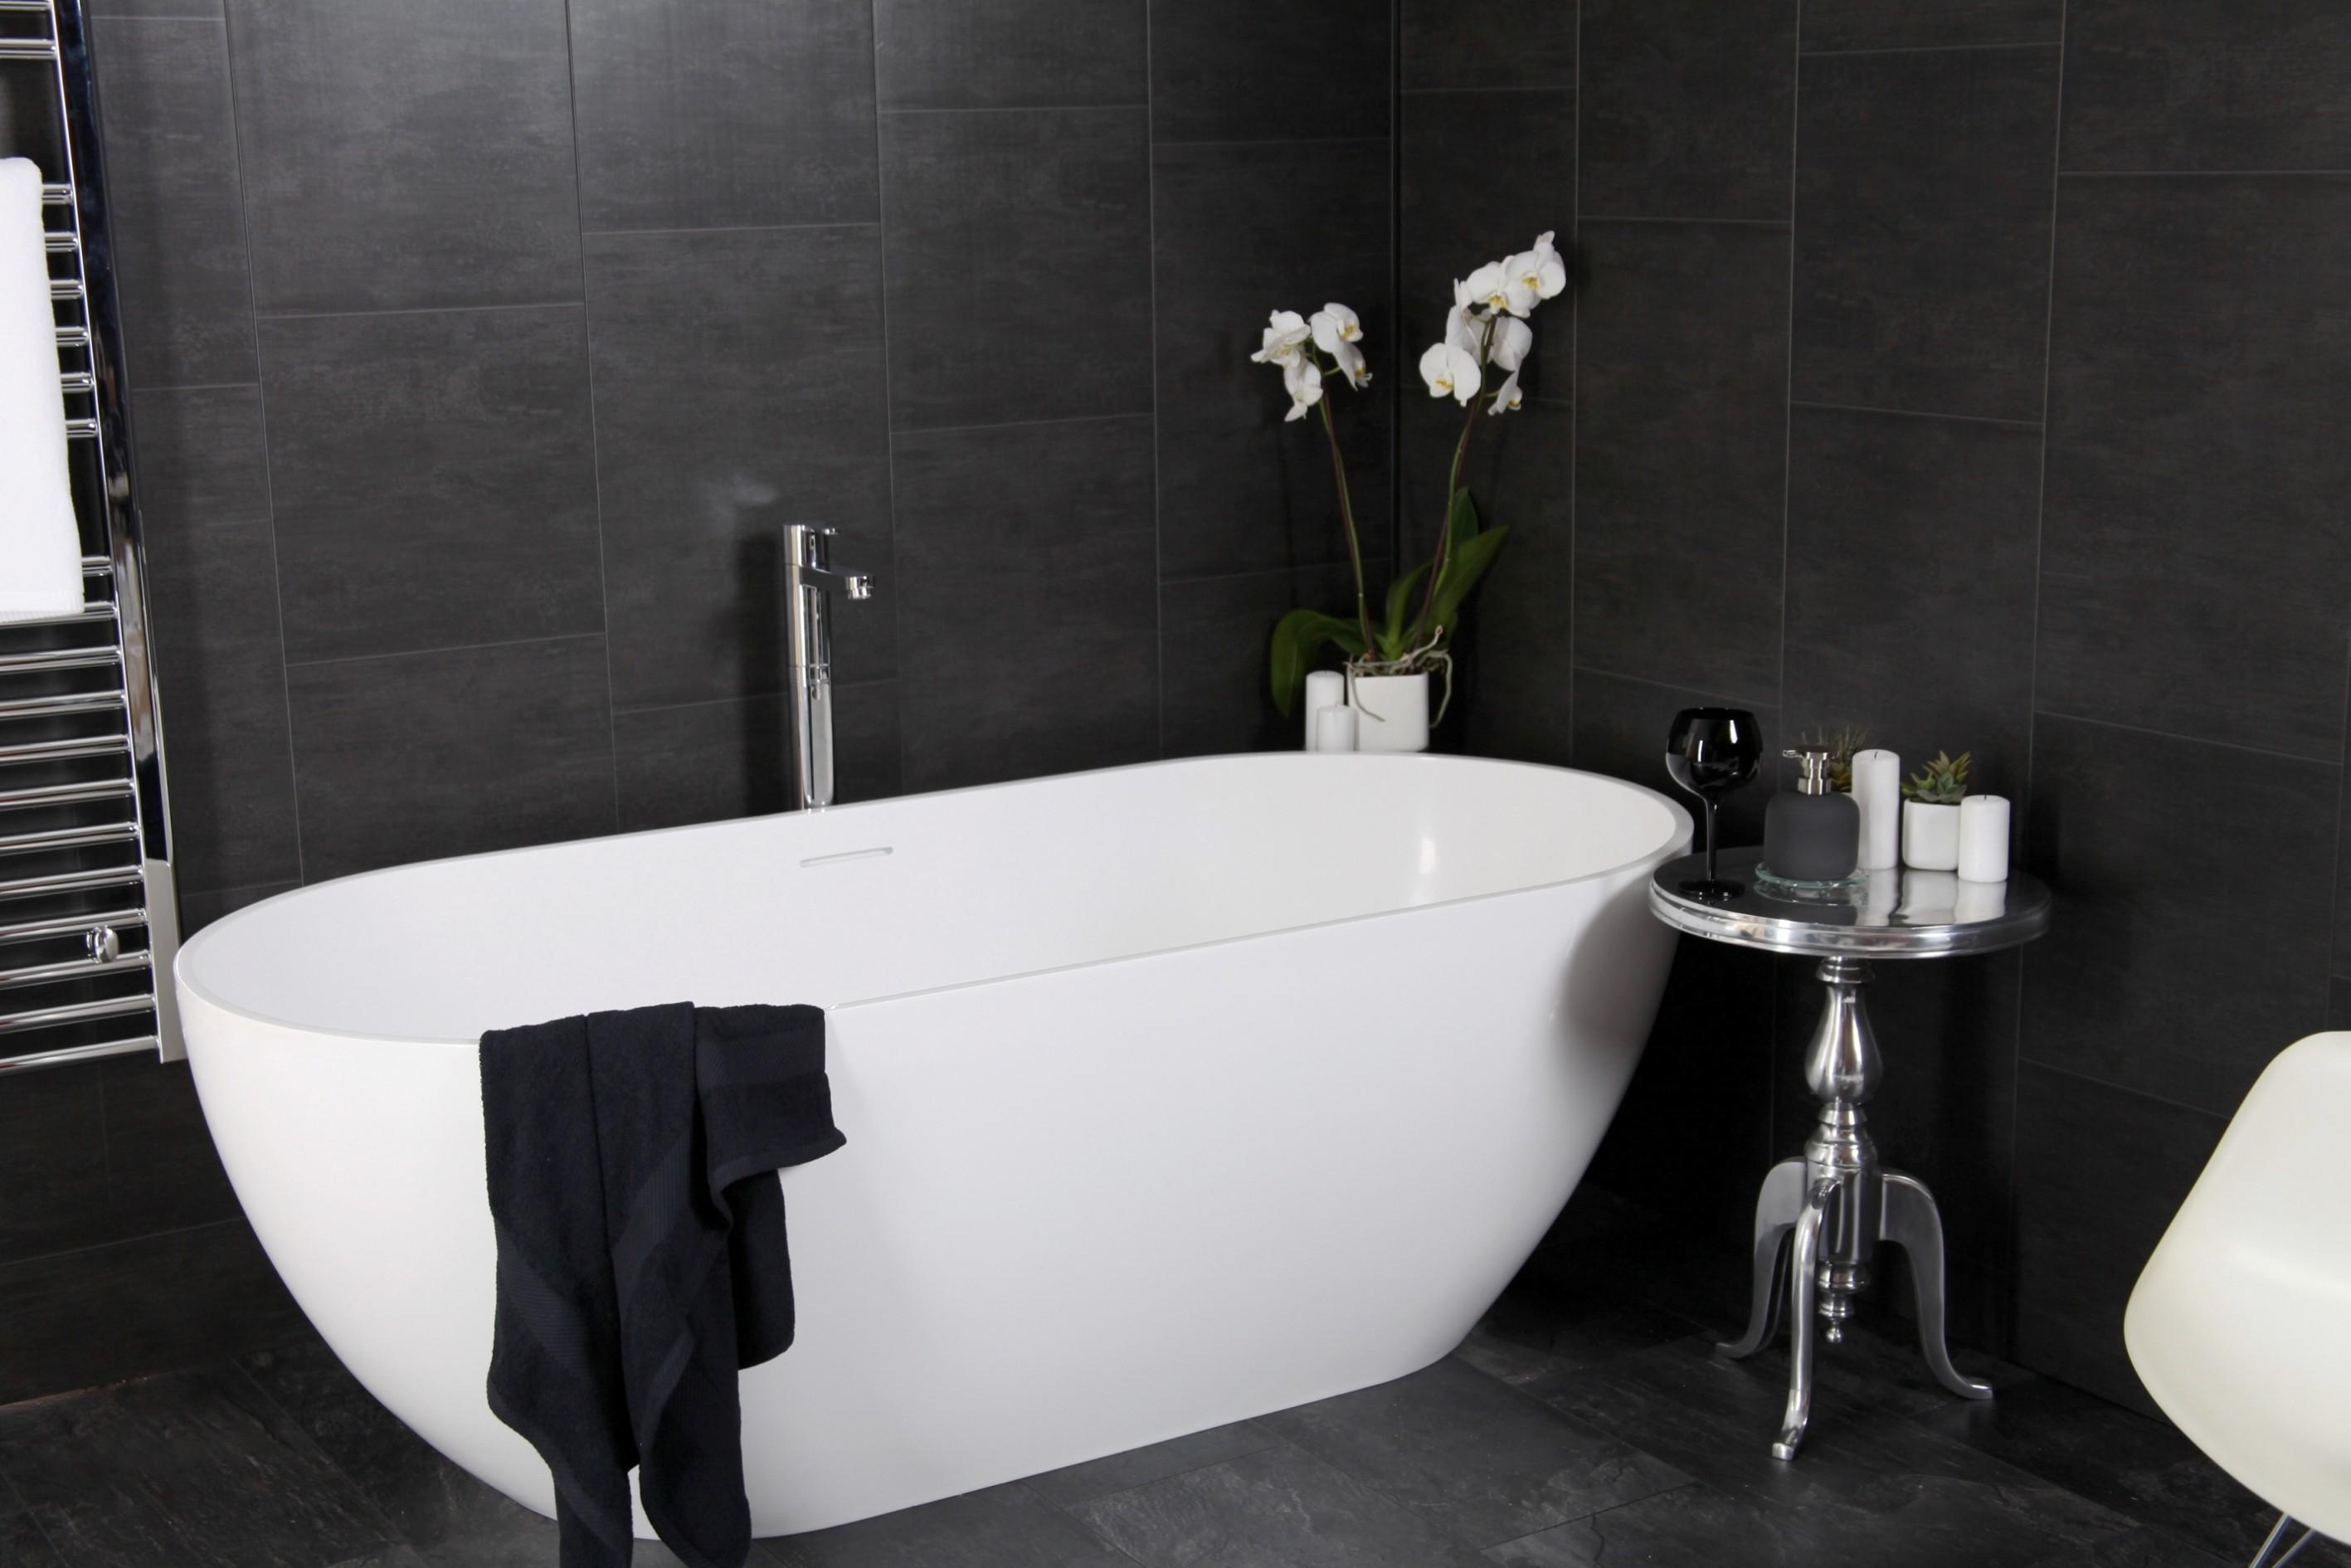 5 easy ways to rejuvenate your bathroom dbs